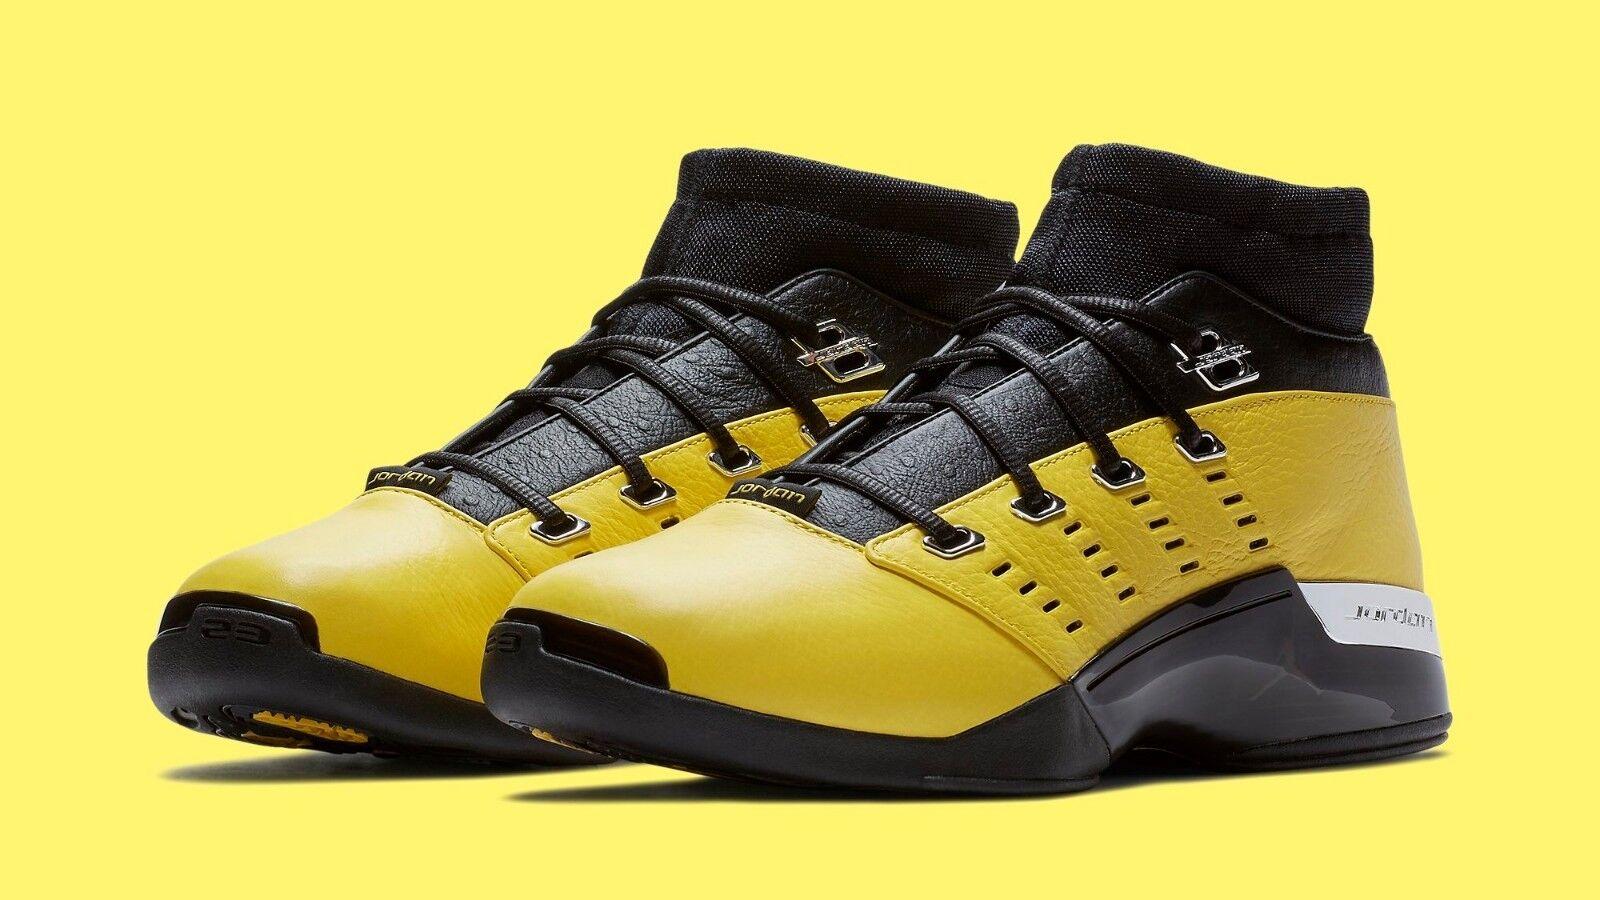 2018 Nike Air Jordan 17 XVII Retro Low Solefly Lightning Size 10.5. AJ7321-003